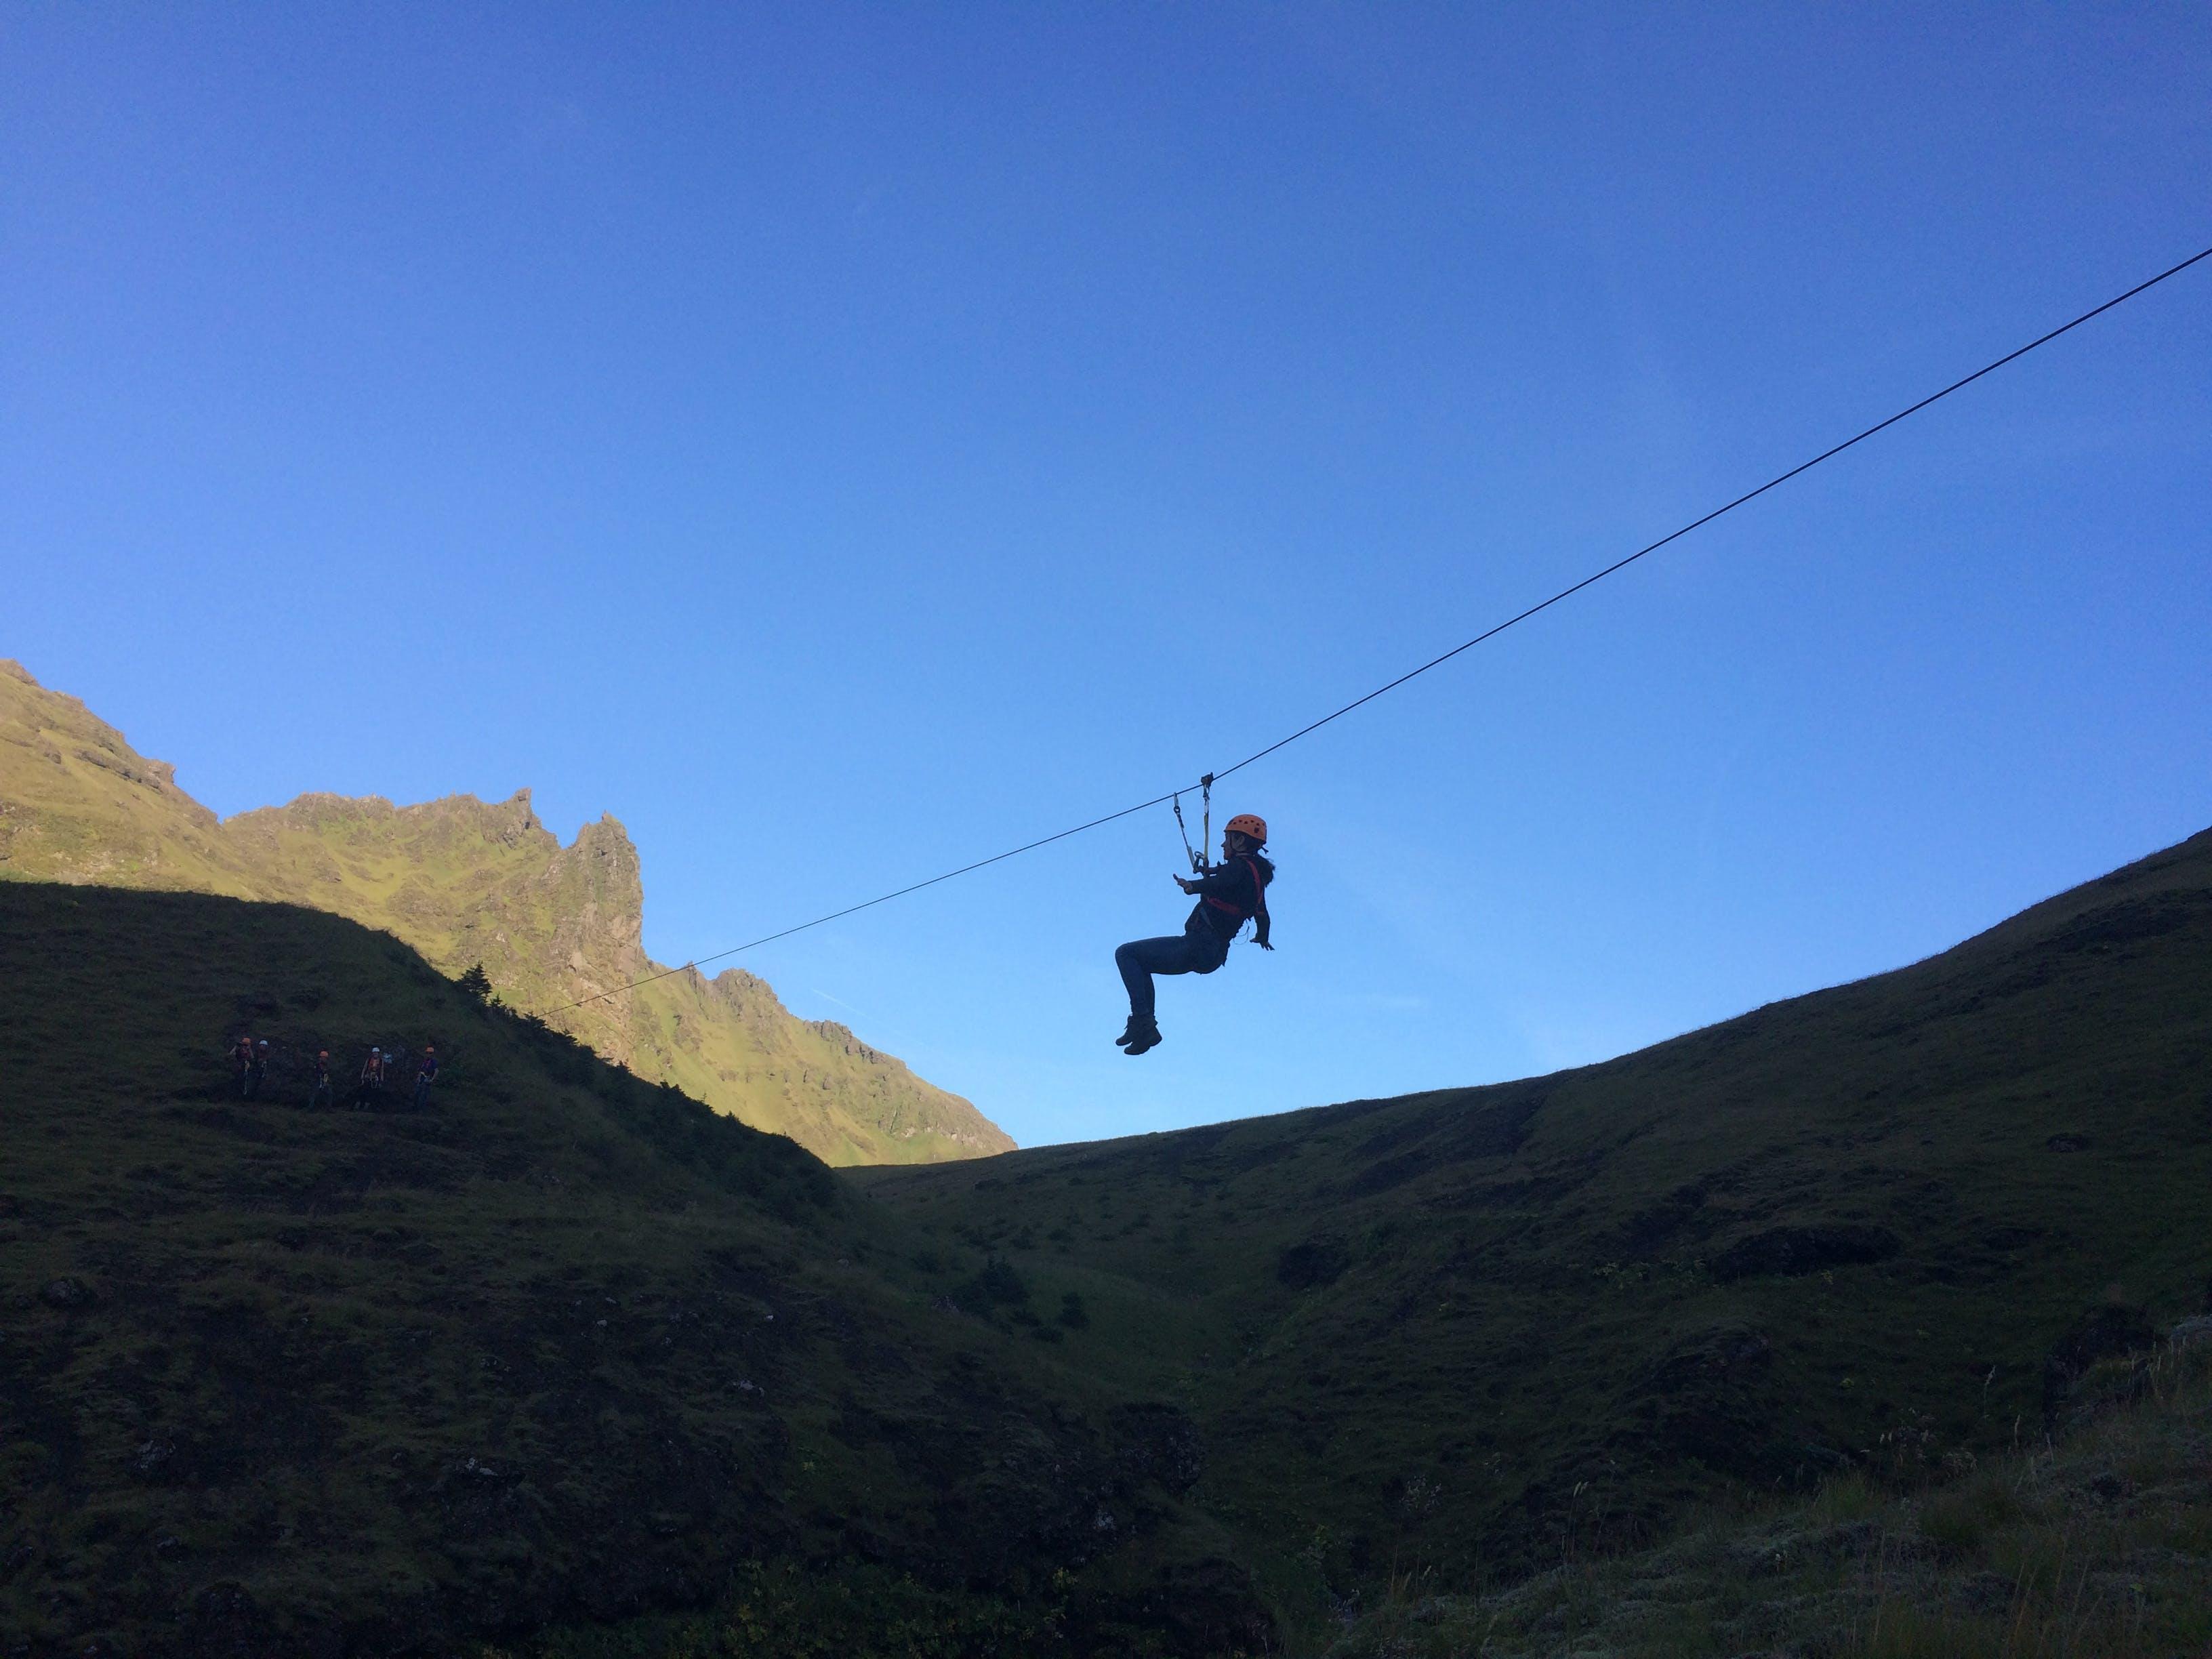 Zipline Adventure in South Iceland from Reykjavik